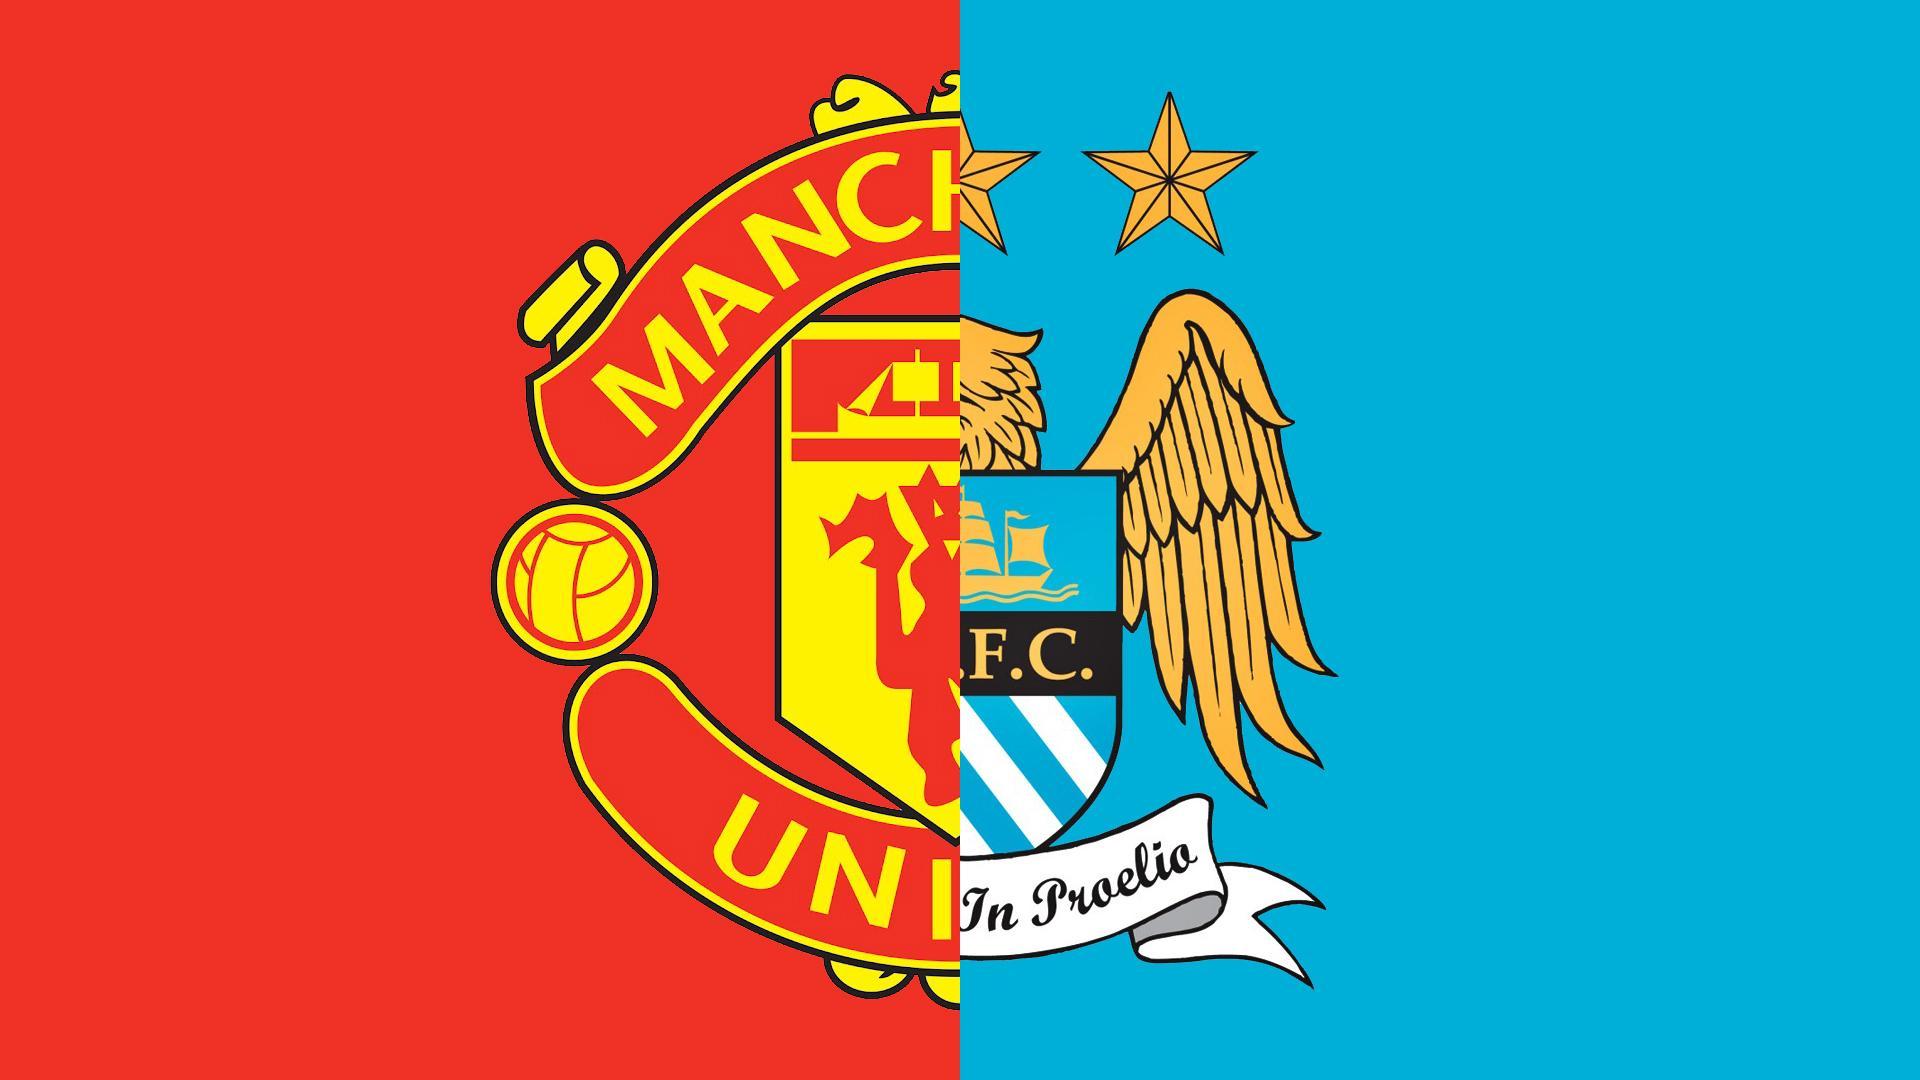 Barcelona Vs Man City Logo: Man United V Man City Betting Preview